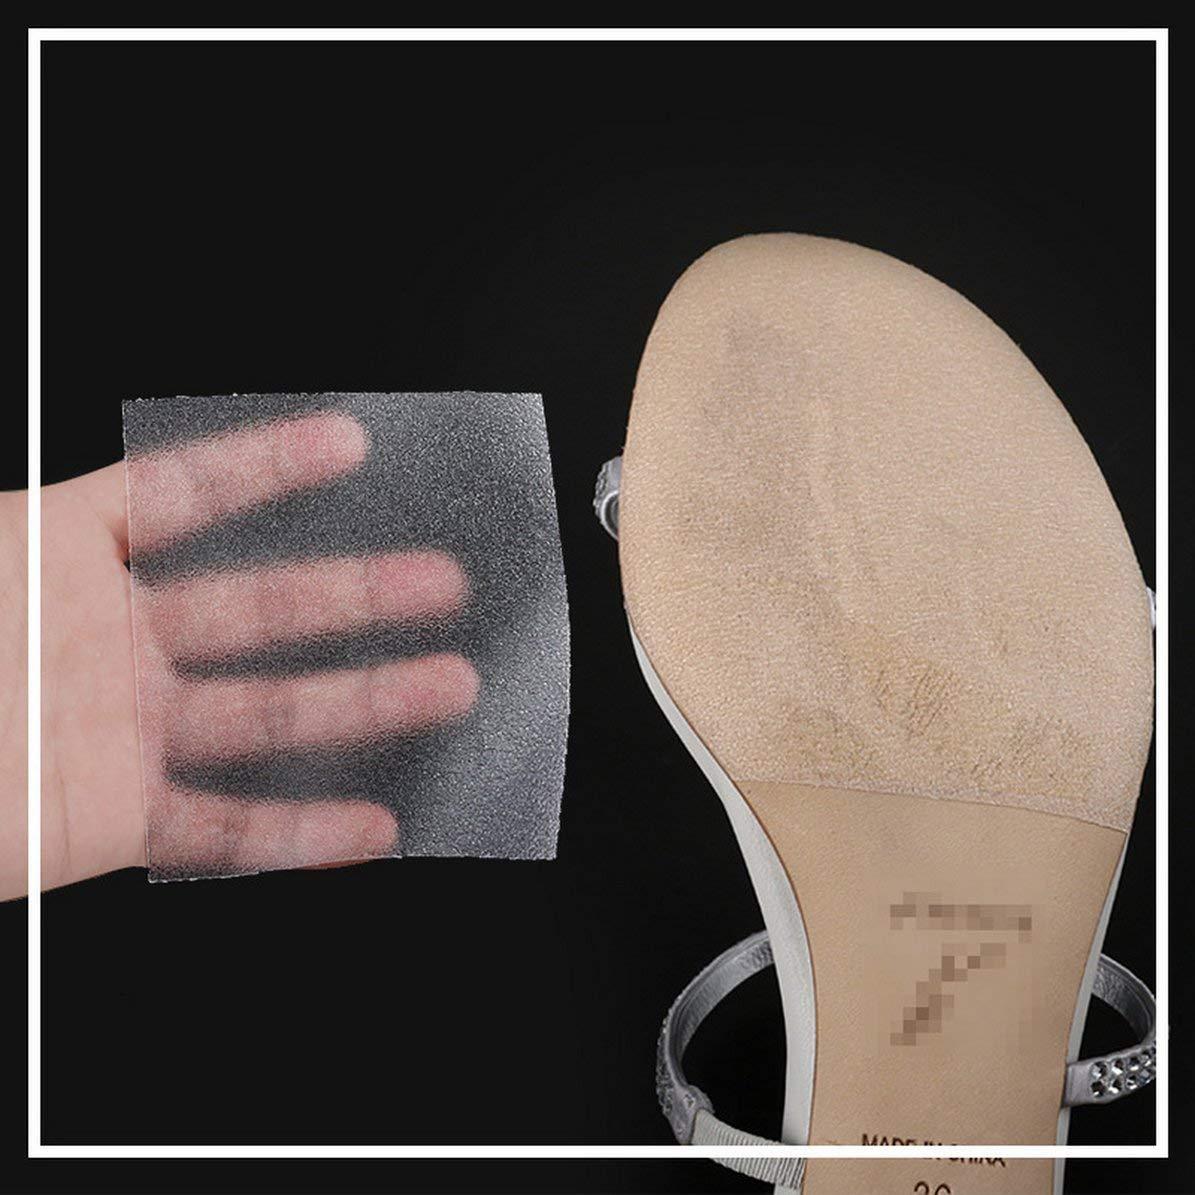 Suela Pegatina Crystal Clear Almohadillas Autoadhesivas Suela Protector Calzados para Zapatos Zapatillas Antideslizantes Suela de Cubierta Pegatinas de antepi/é WEIWEITOE